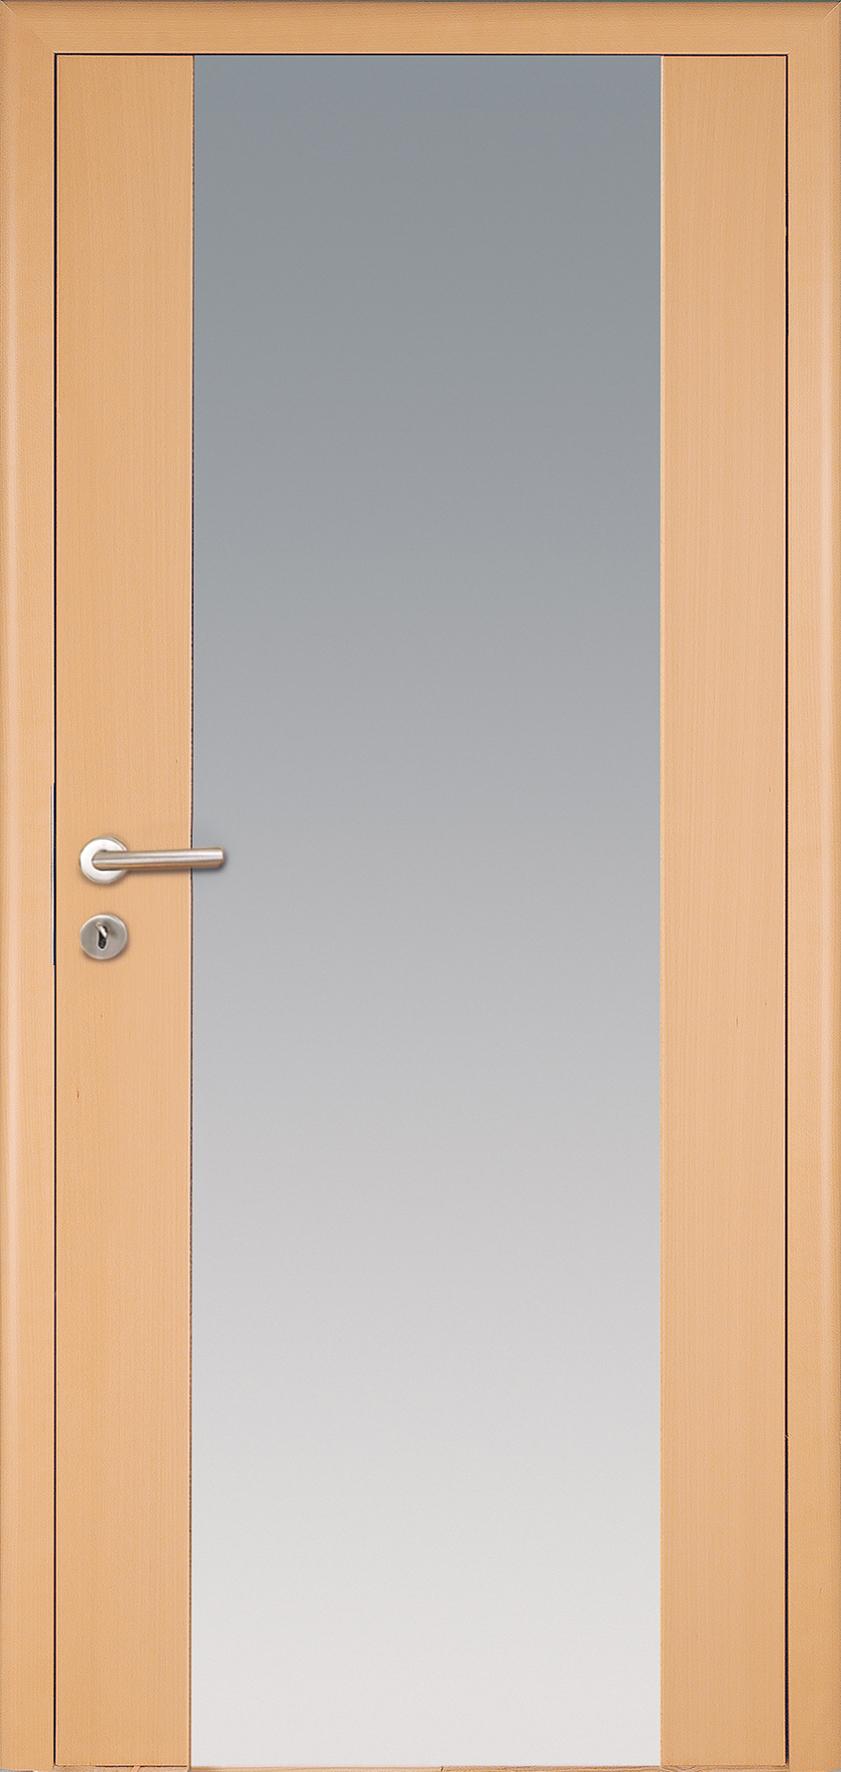 modernes echtholzt relement vetro buche natur von herholz. Black Bedroom Furniture Sets. Home Design Ideas